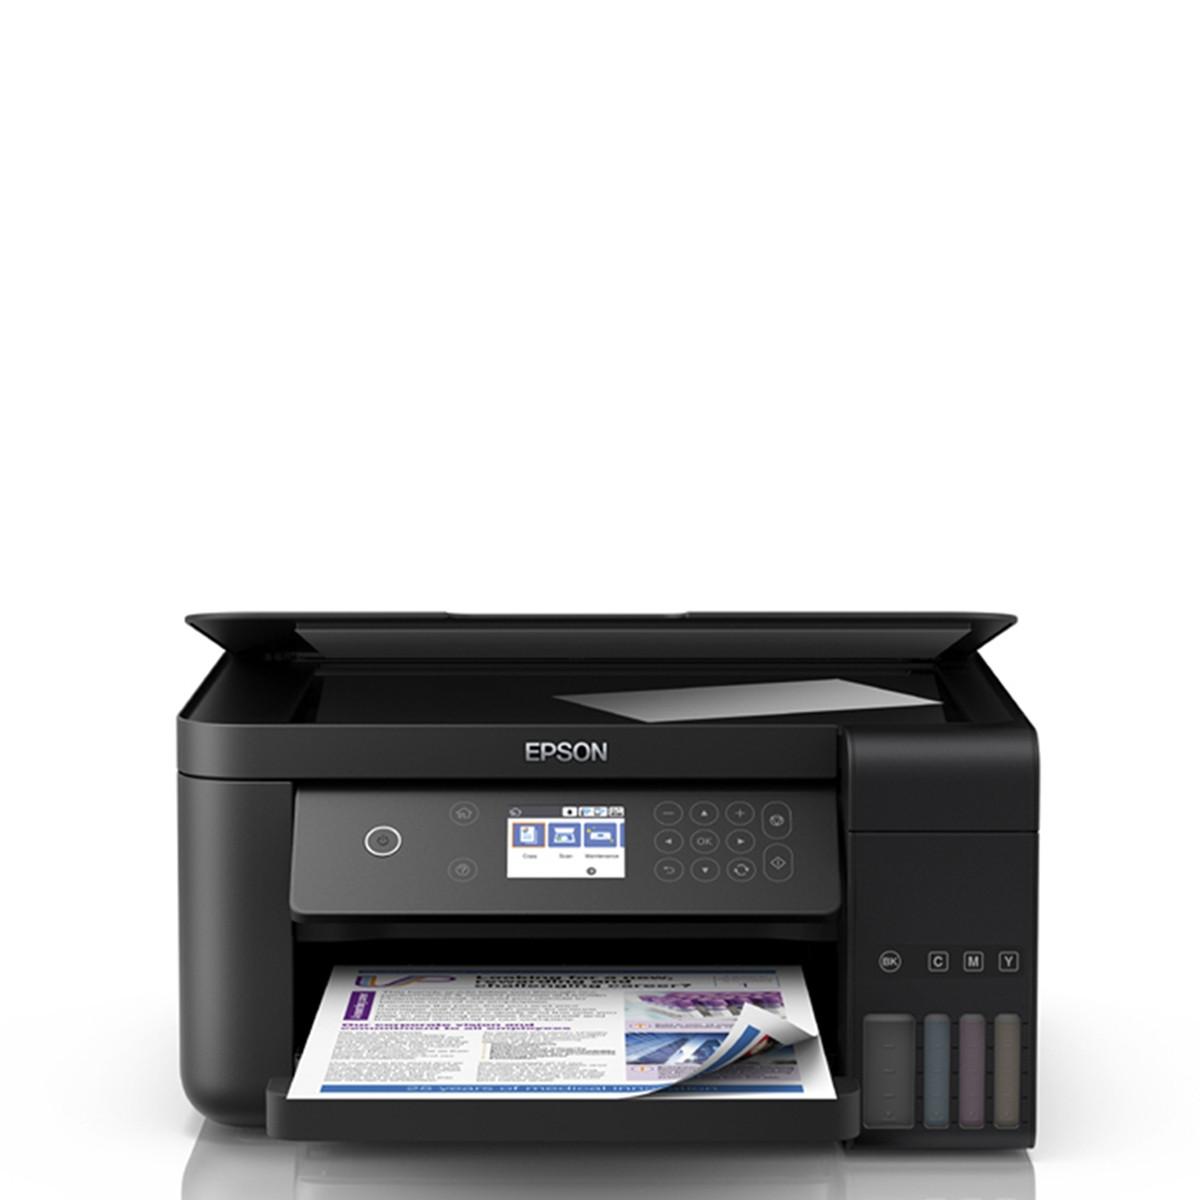 Impressora Epson L6161 | Multifuncional Tanque de Tinta com Wireless e Duplex